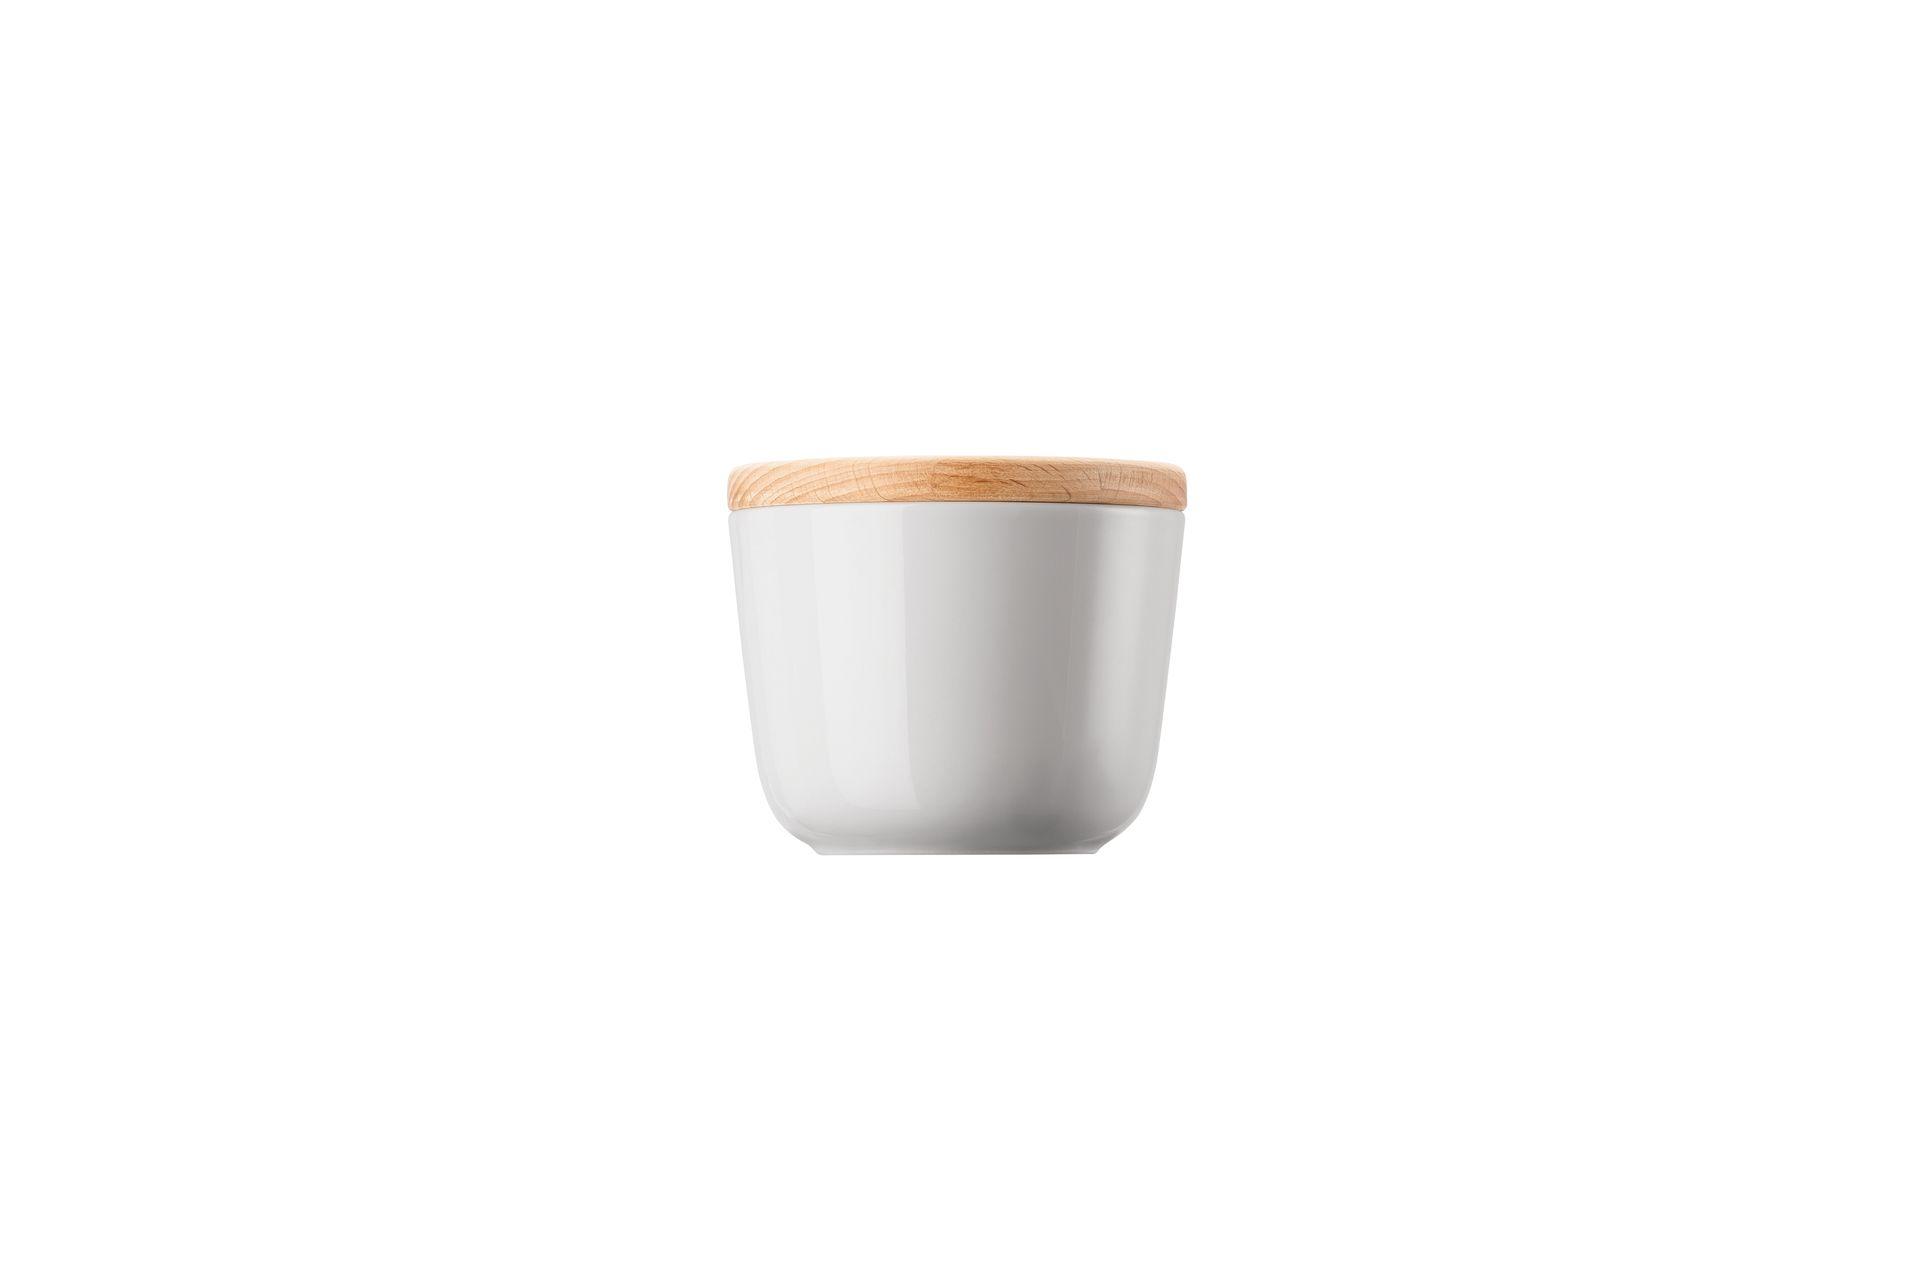 Thomas ONO Jam Pot + Lid thumb 2